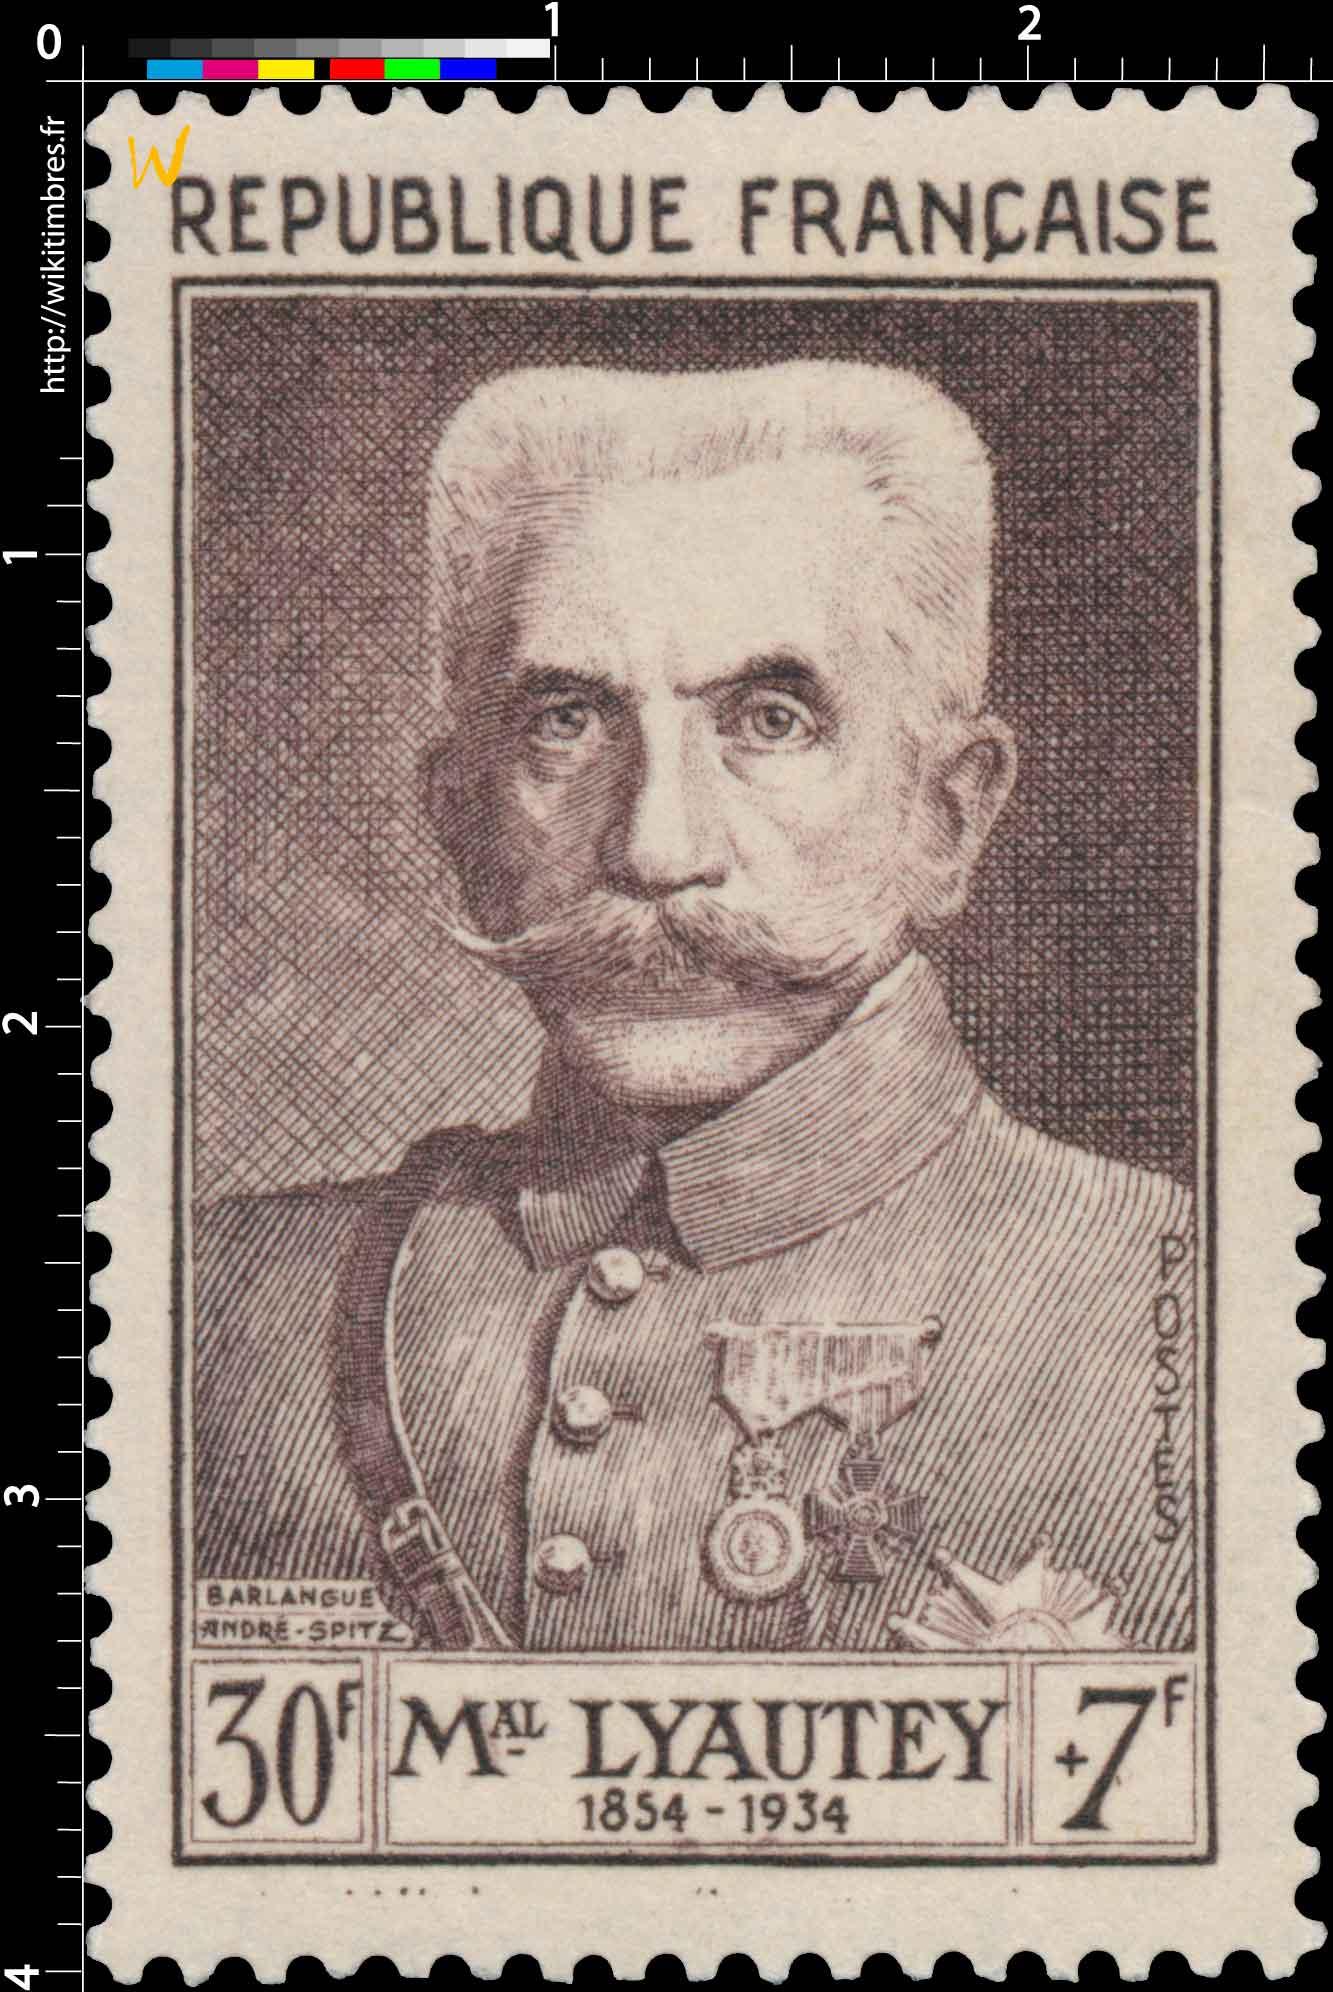 MAL LYAUTEY 1854-1934